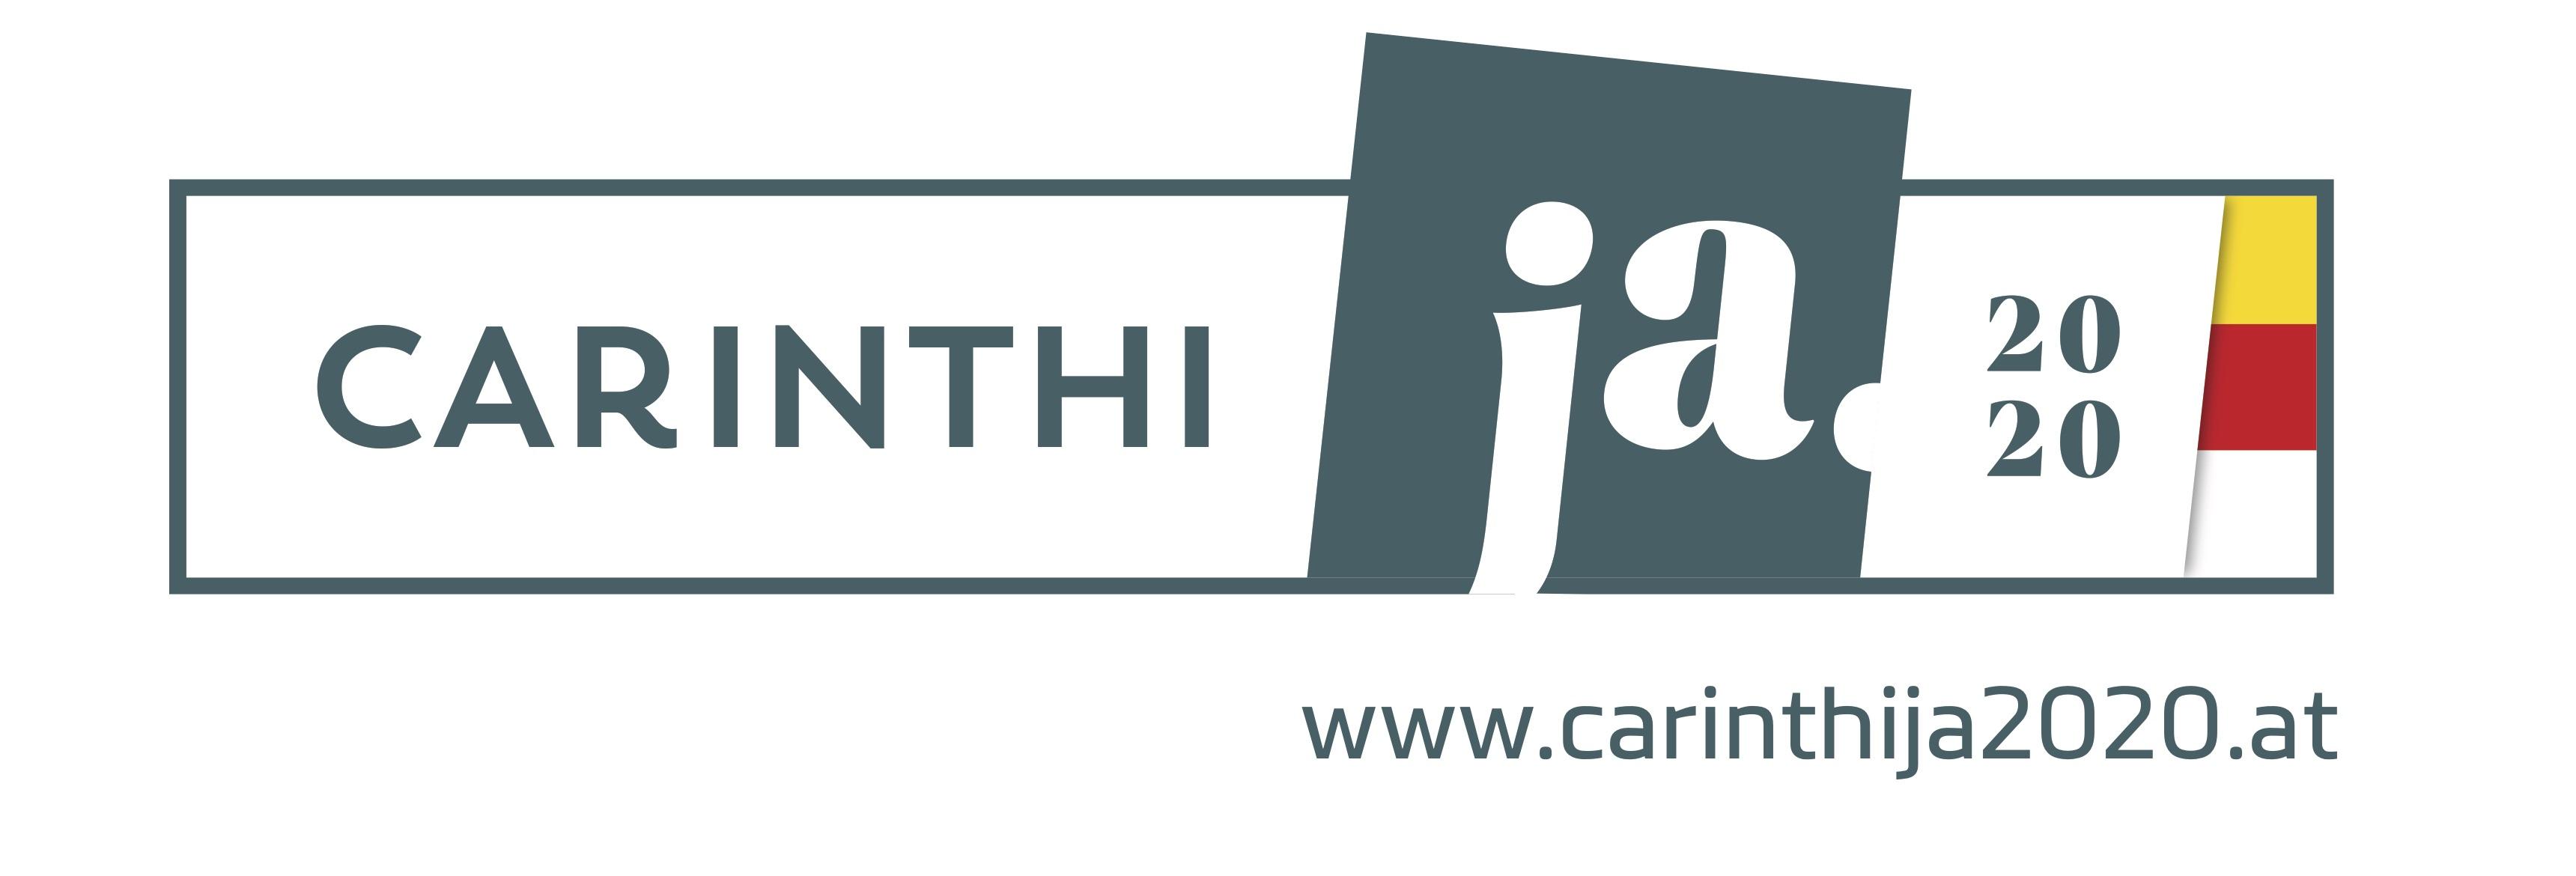 CarinthiJa2020_hoch_4c_url